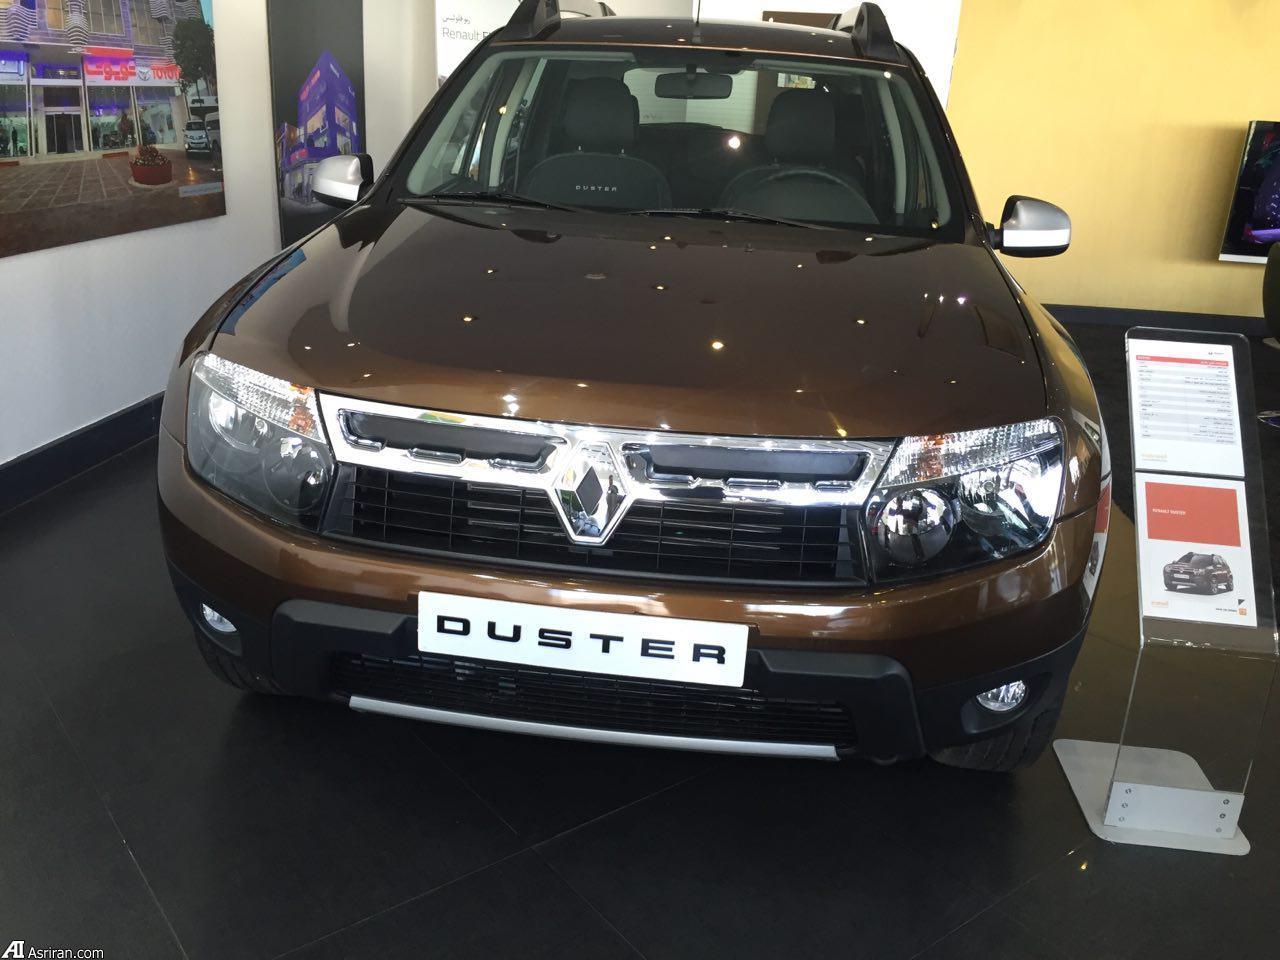 محصولات نگین خودرو قیمت رنو داستر فروش رنو داستر فروش اقساطی خودرو خودرو قسطی Renault Duster